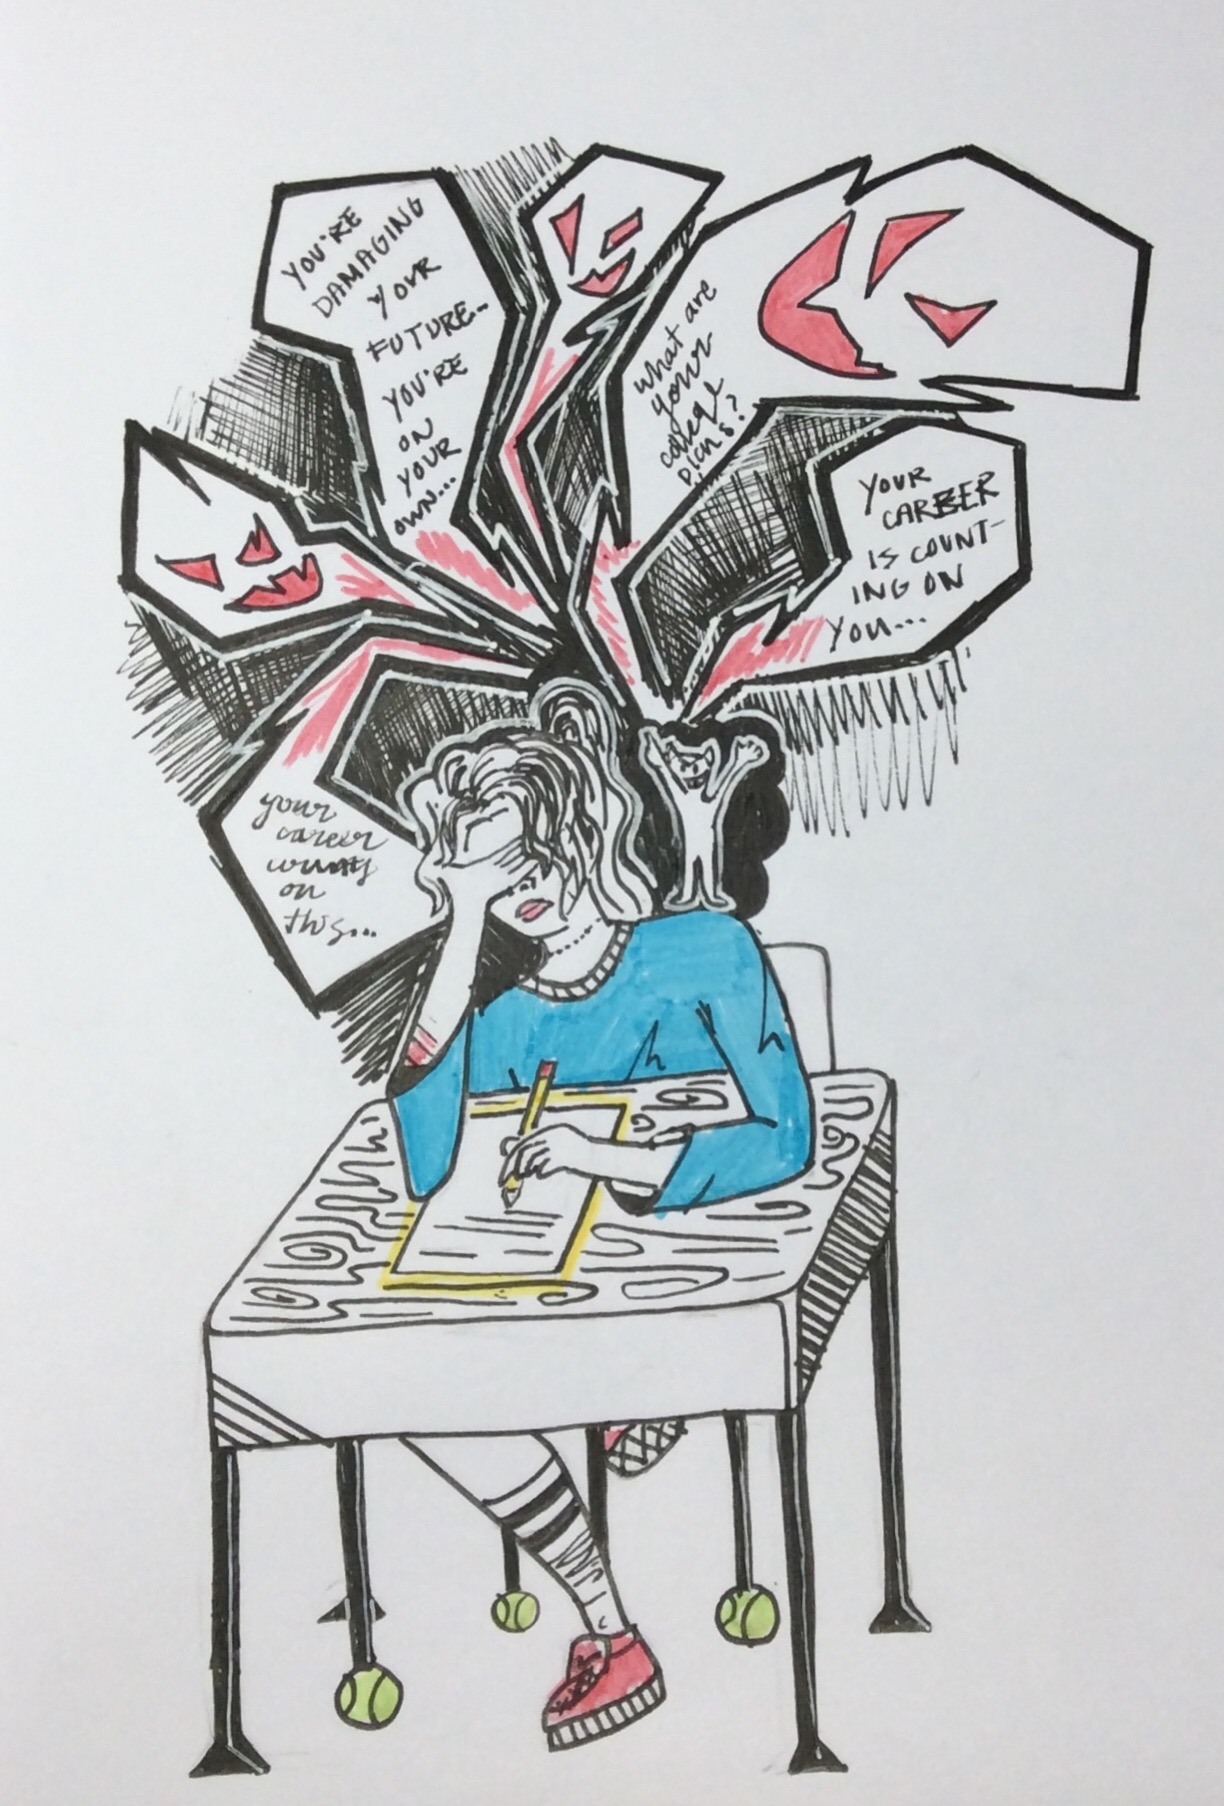 Post-High School Plans